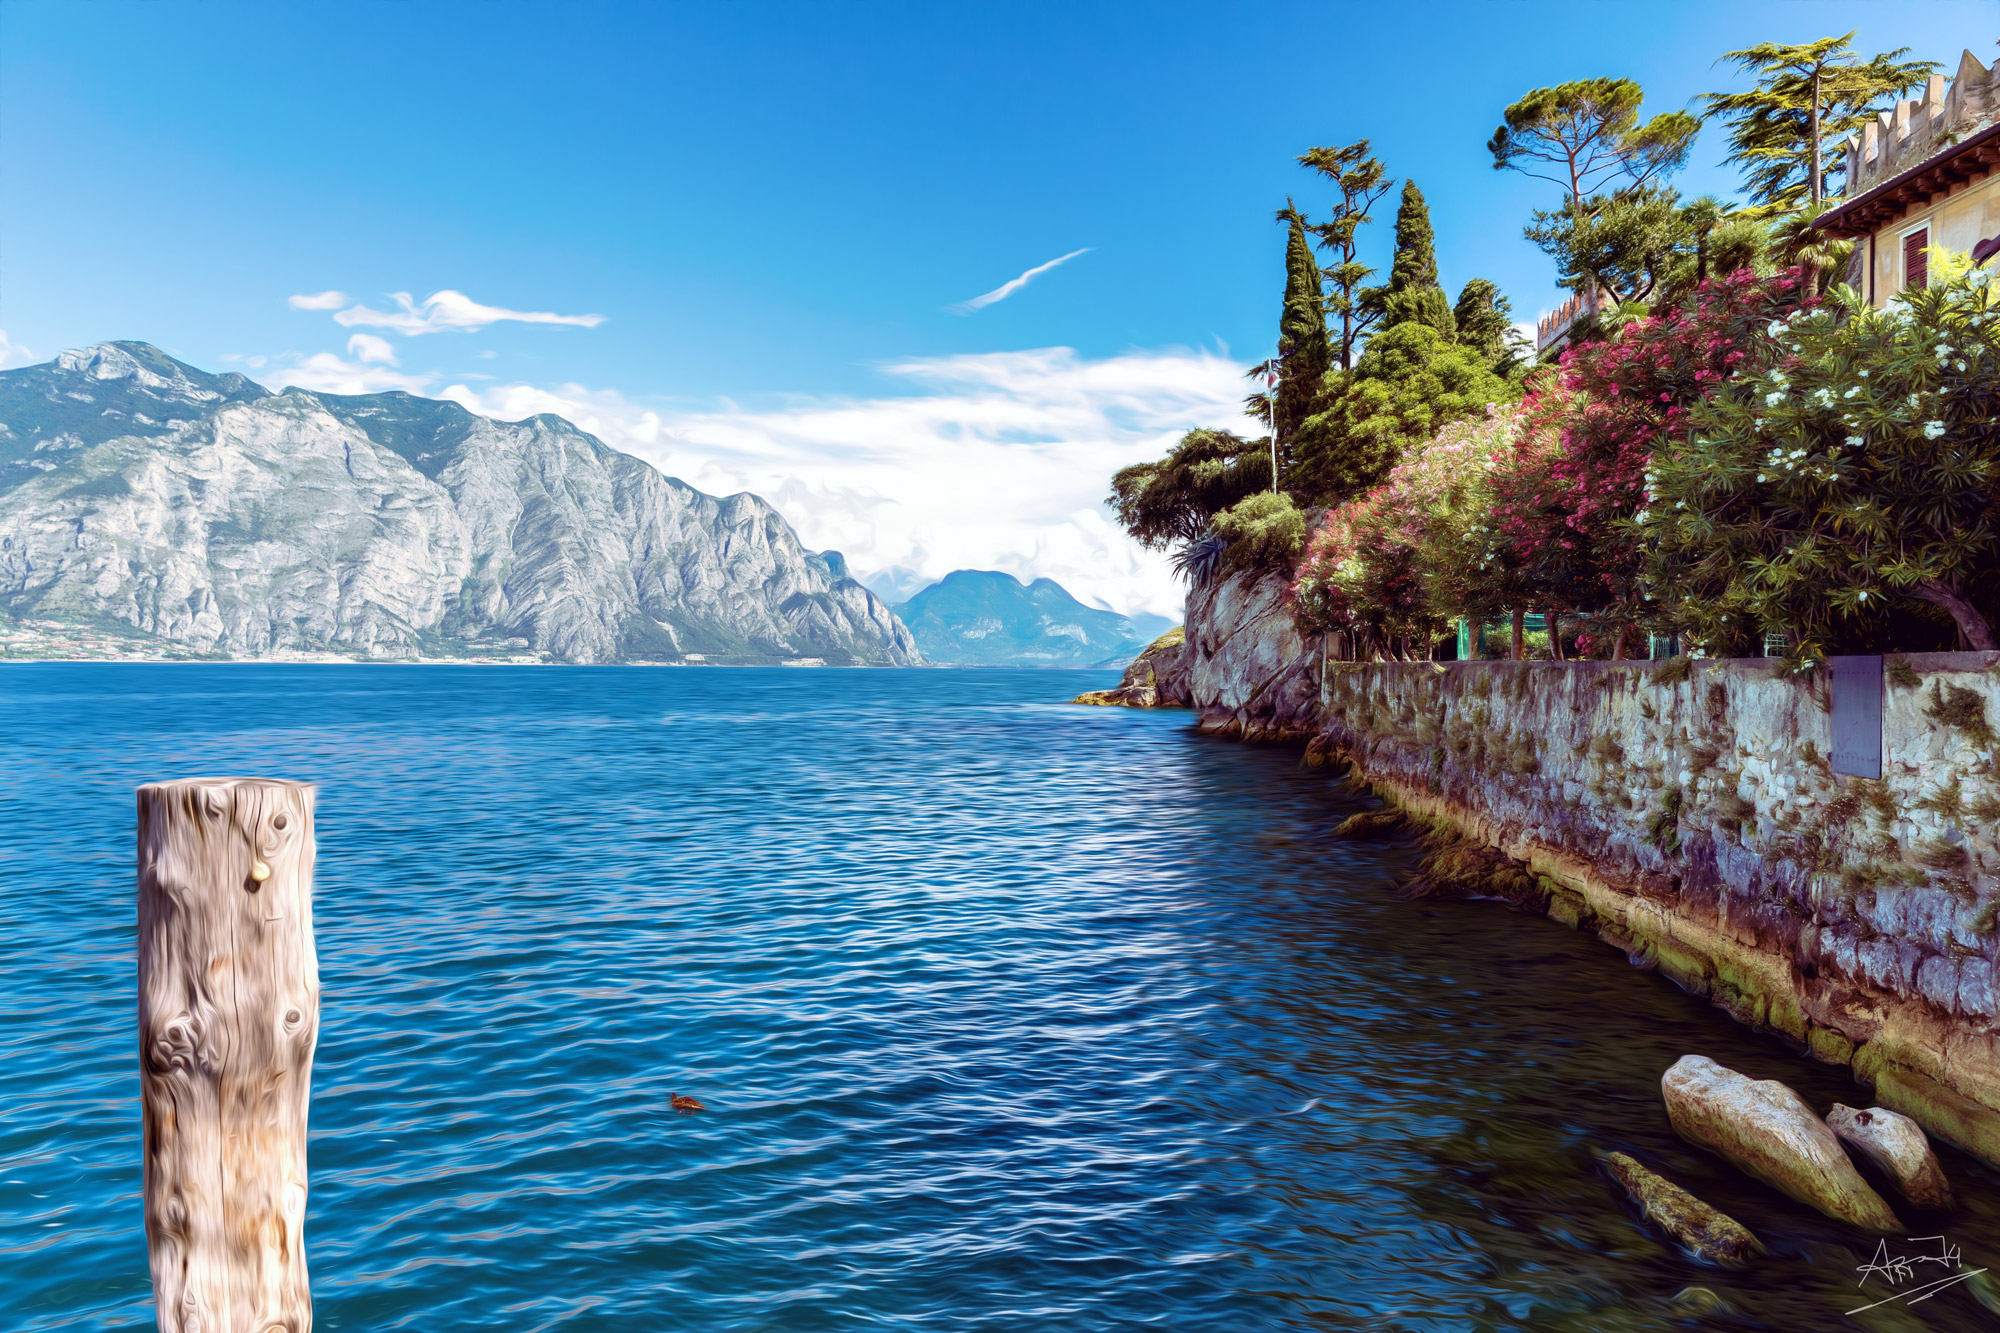 Steeg am Gardasee